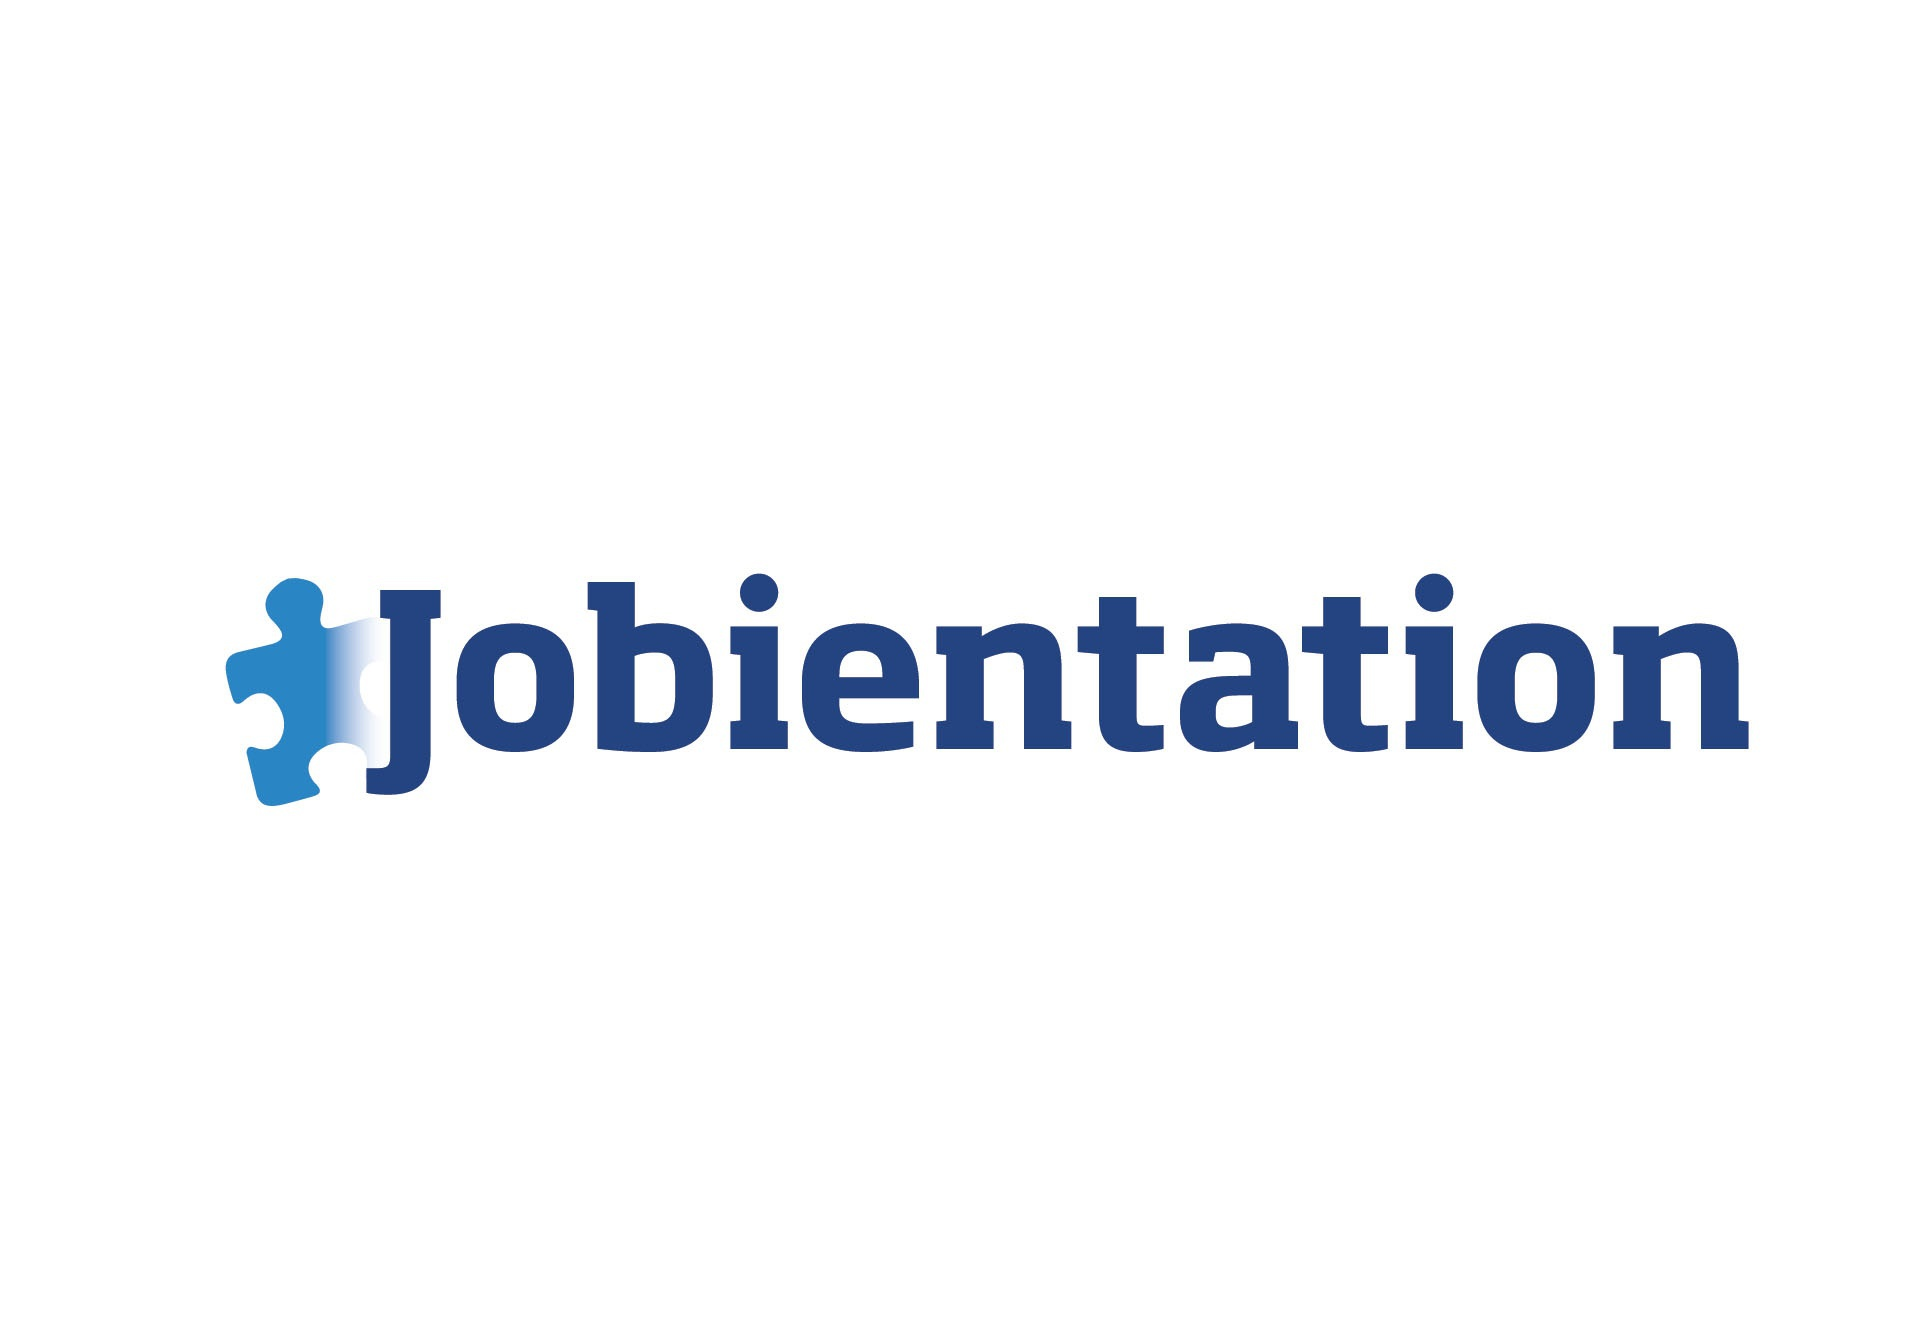 Jobientation